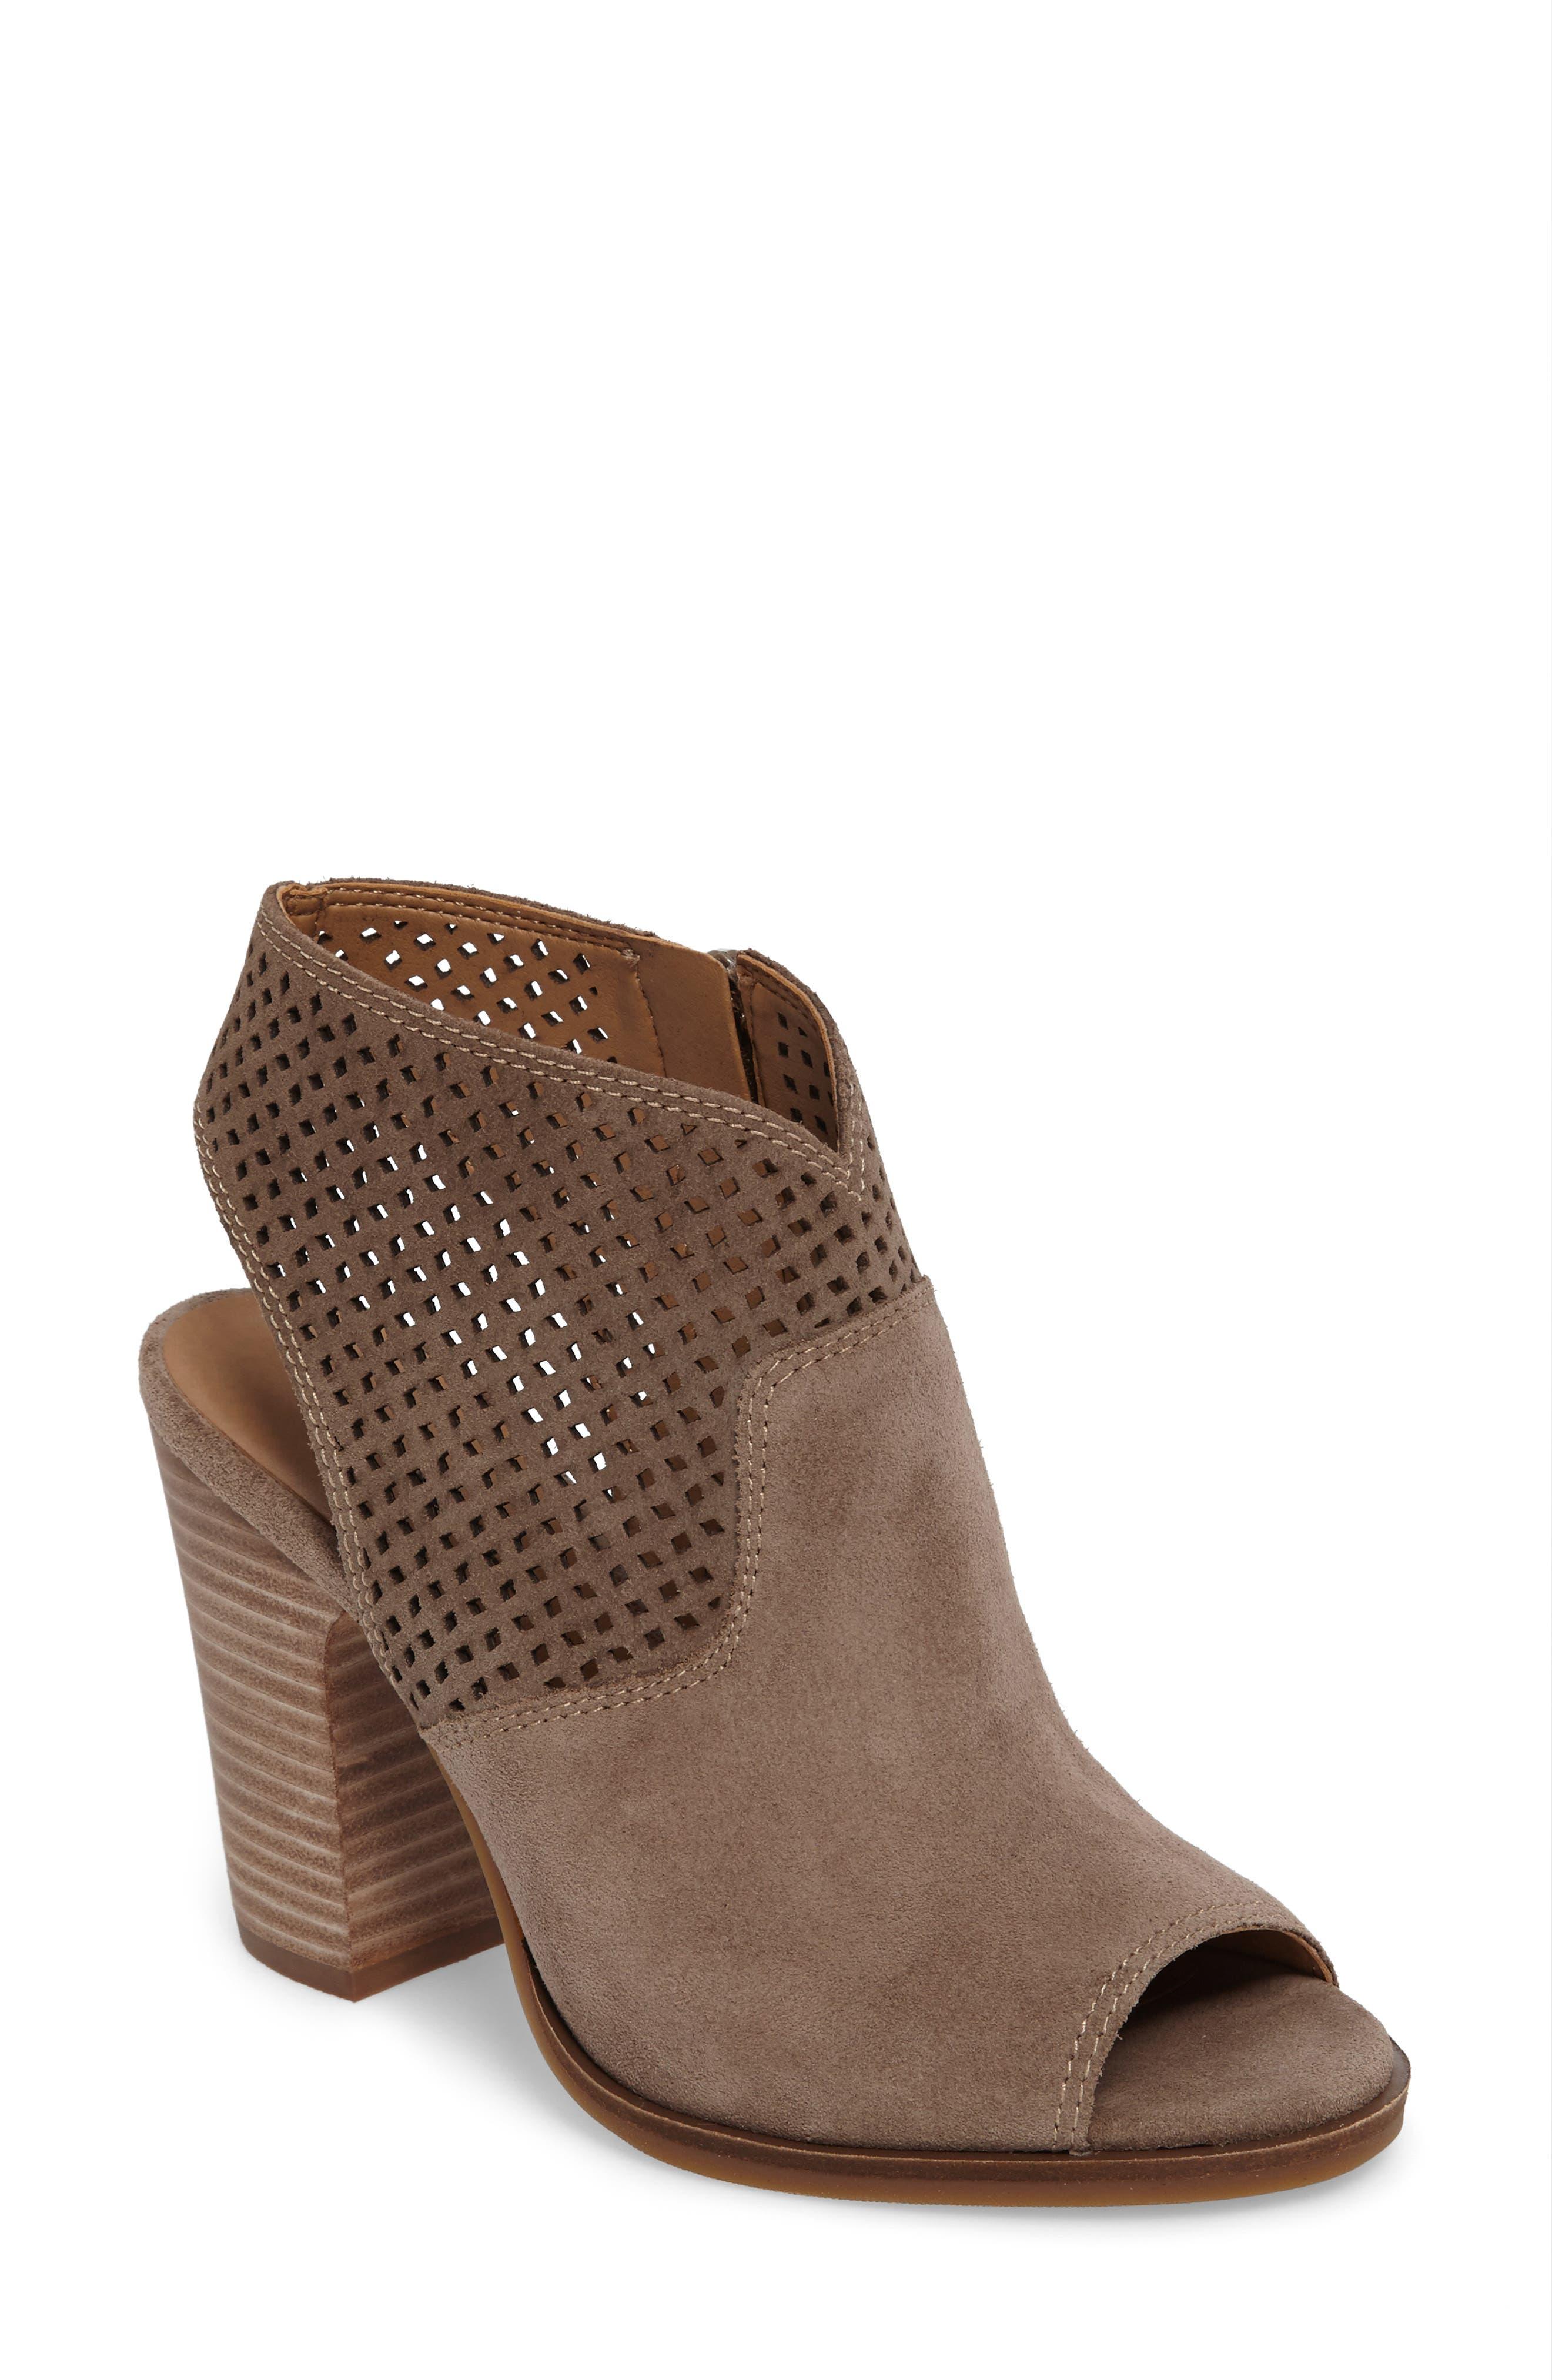 Main Image - Lucky Brand Lizara Perforated Block Heel Sandal (Women)